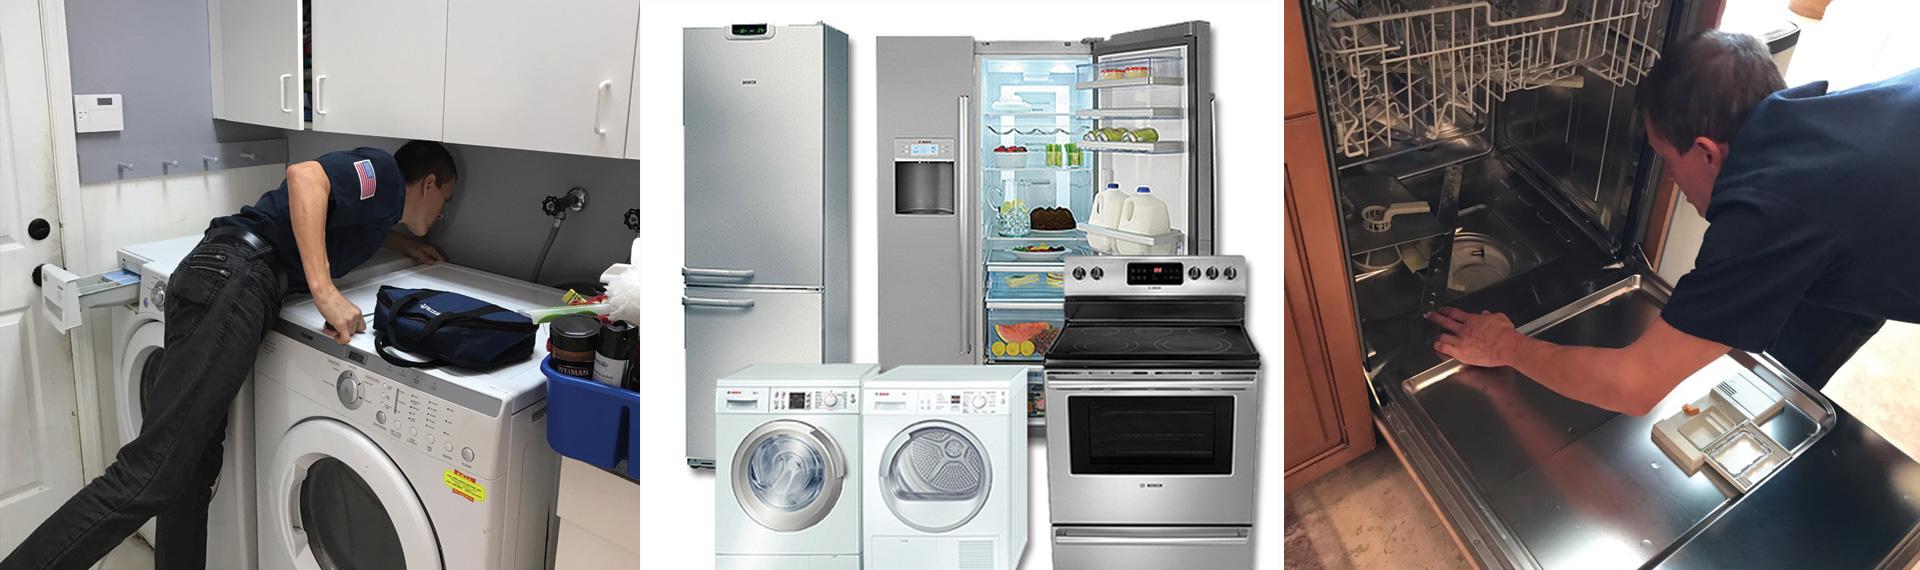 1A Appliance Service Boca Raton FL